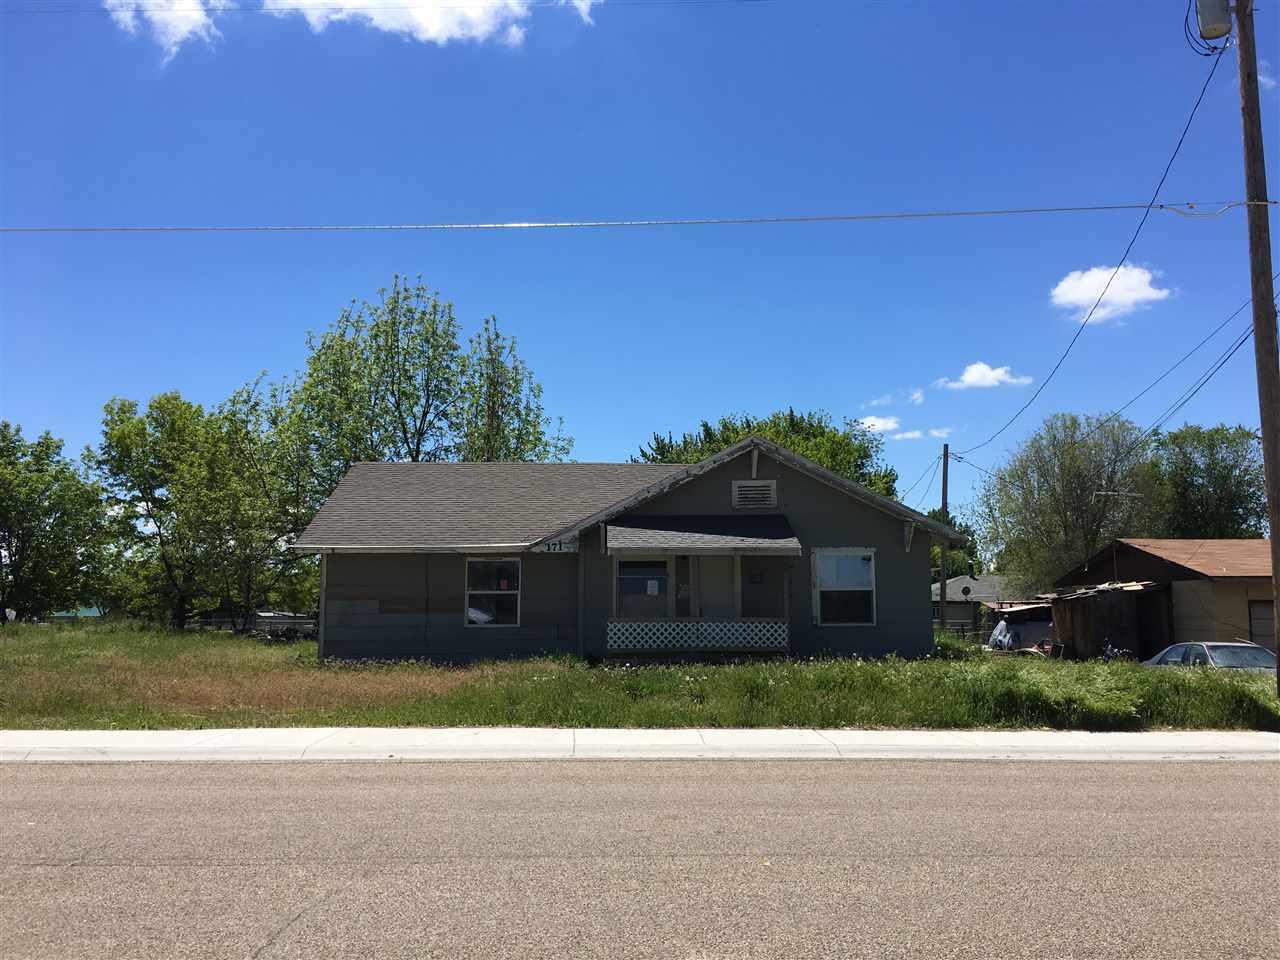 171 Concord St., Middleton, ID - USA (photo 1)